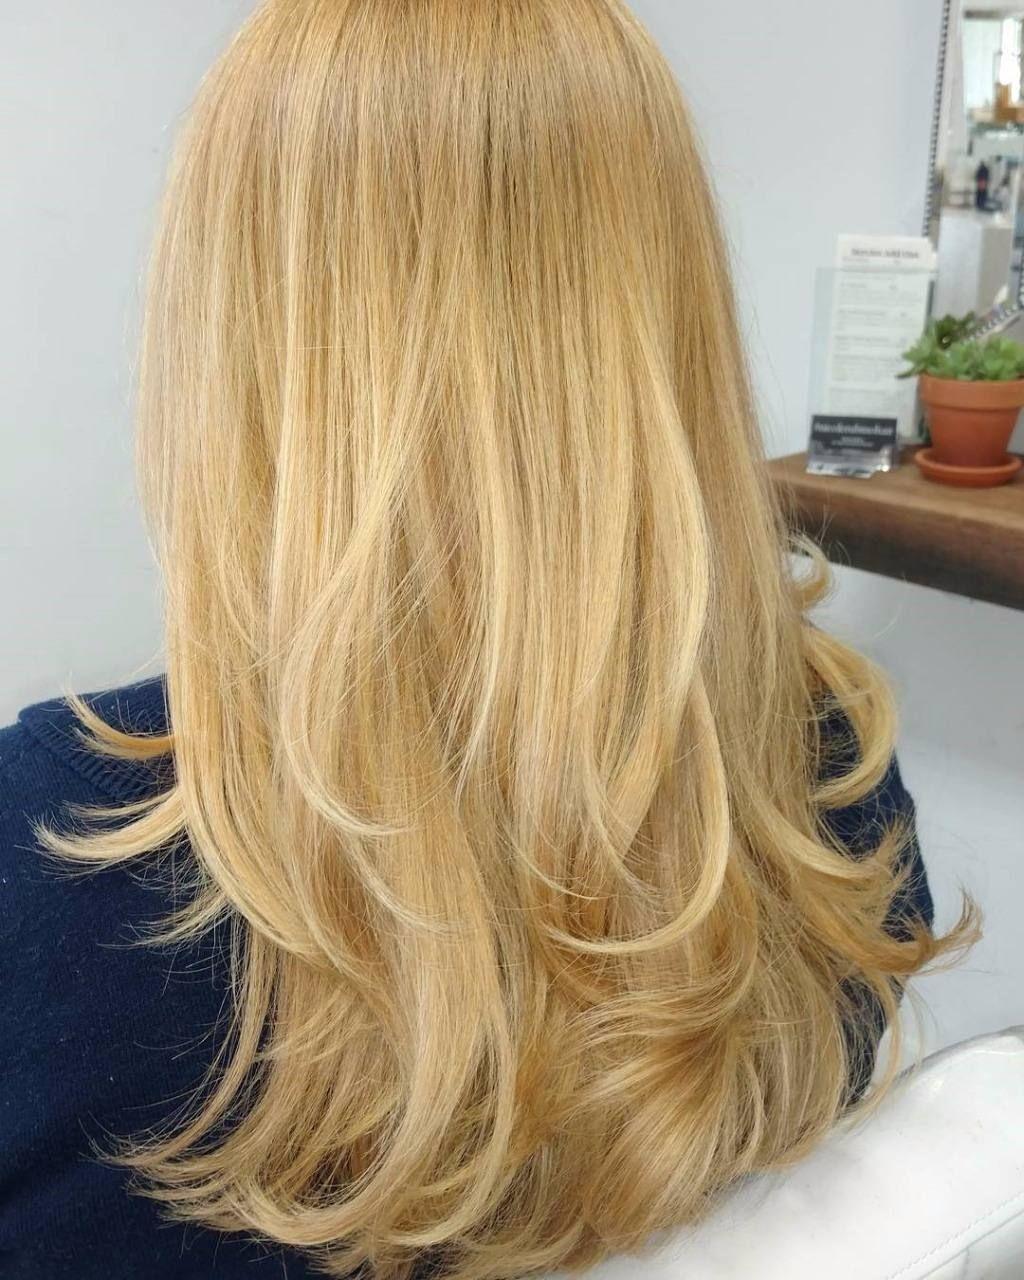 Sunset Blonde 9 0 20 Volume Developer Highlights With Lightening